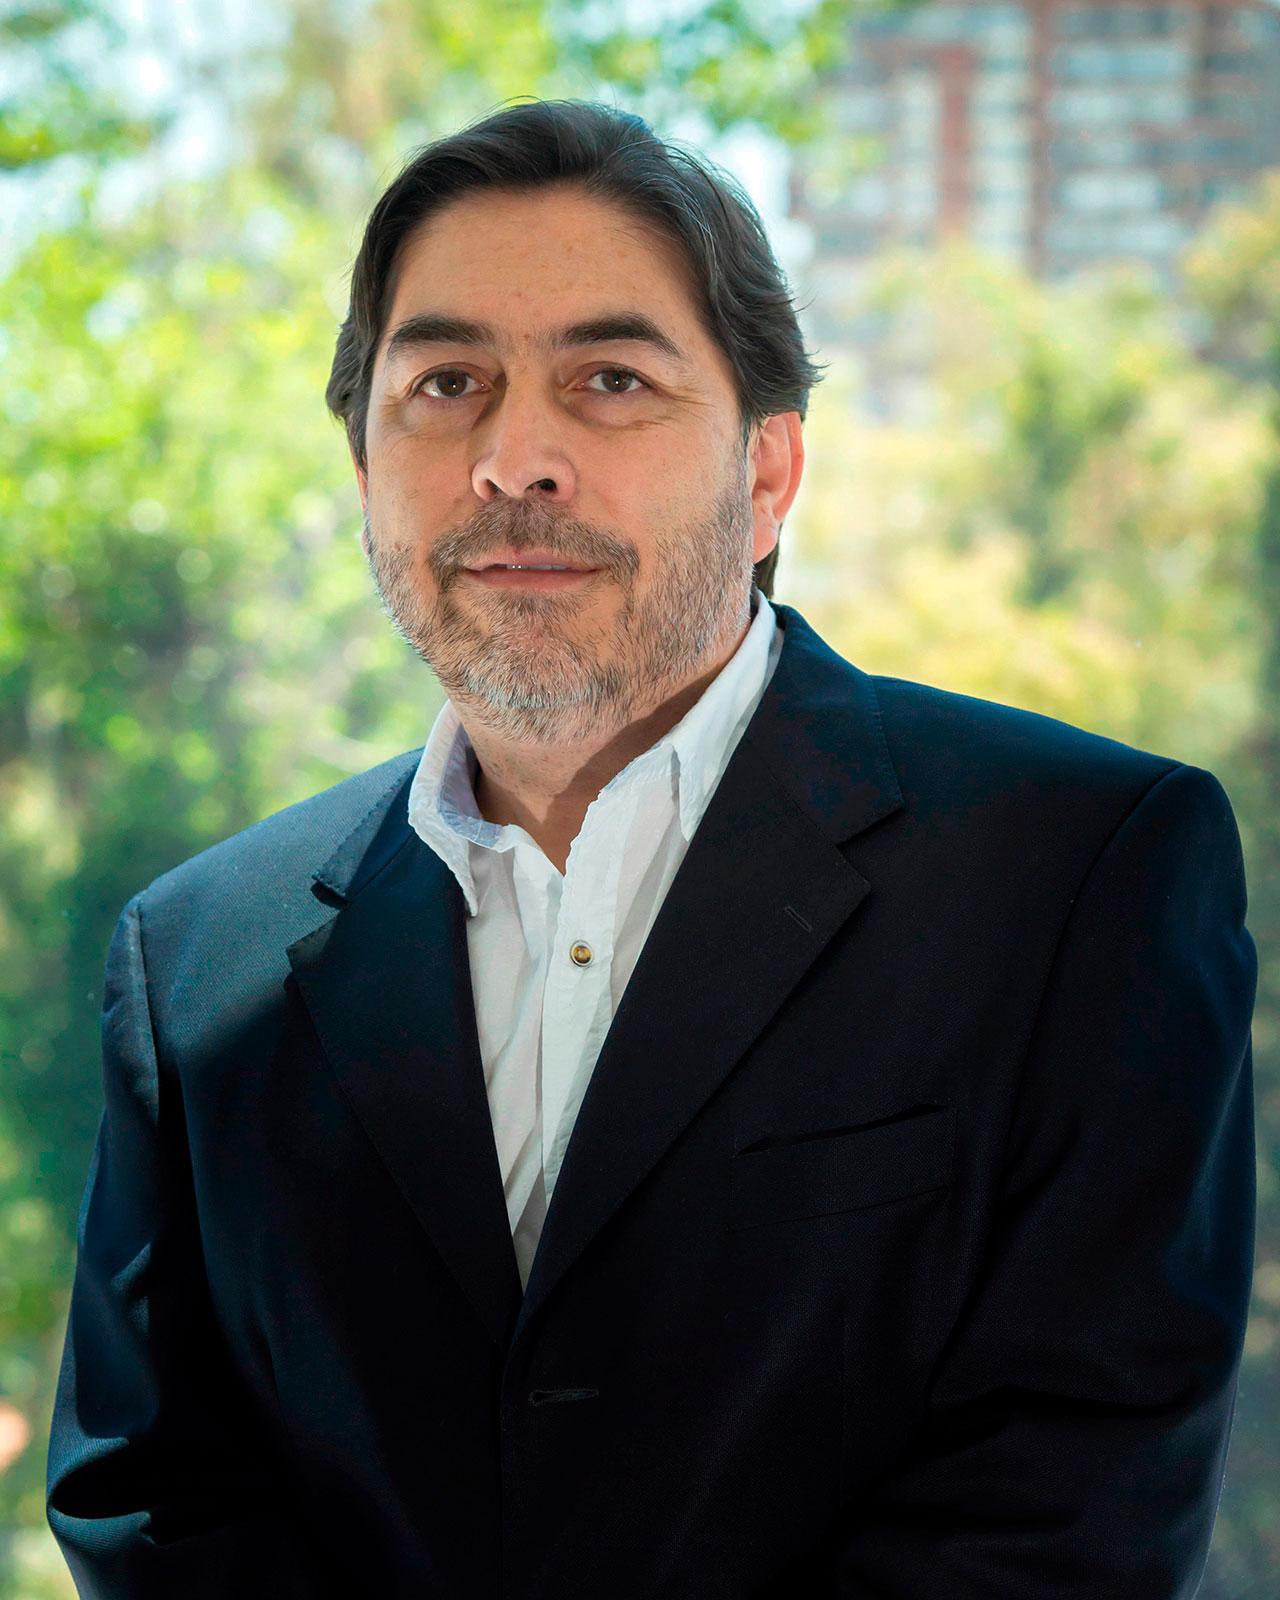 Edmundo Soto